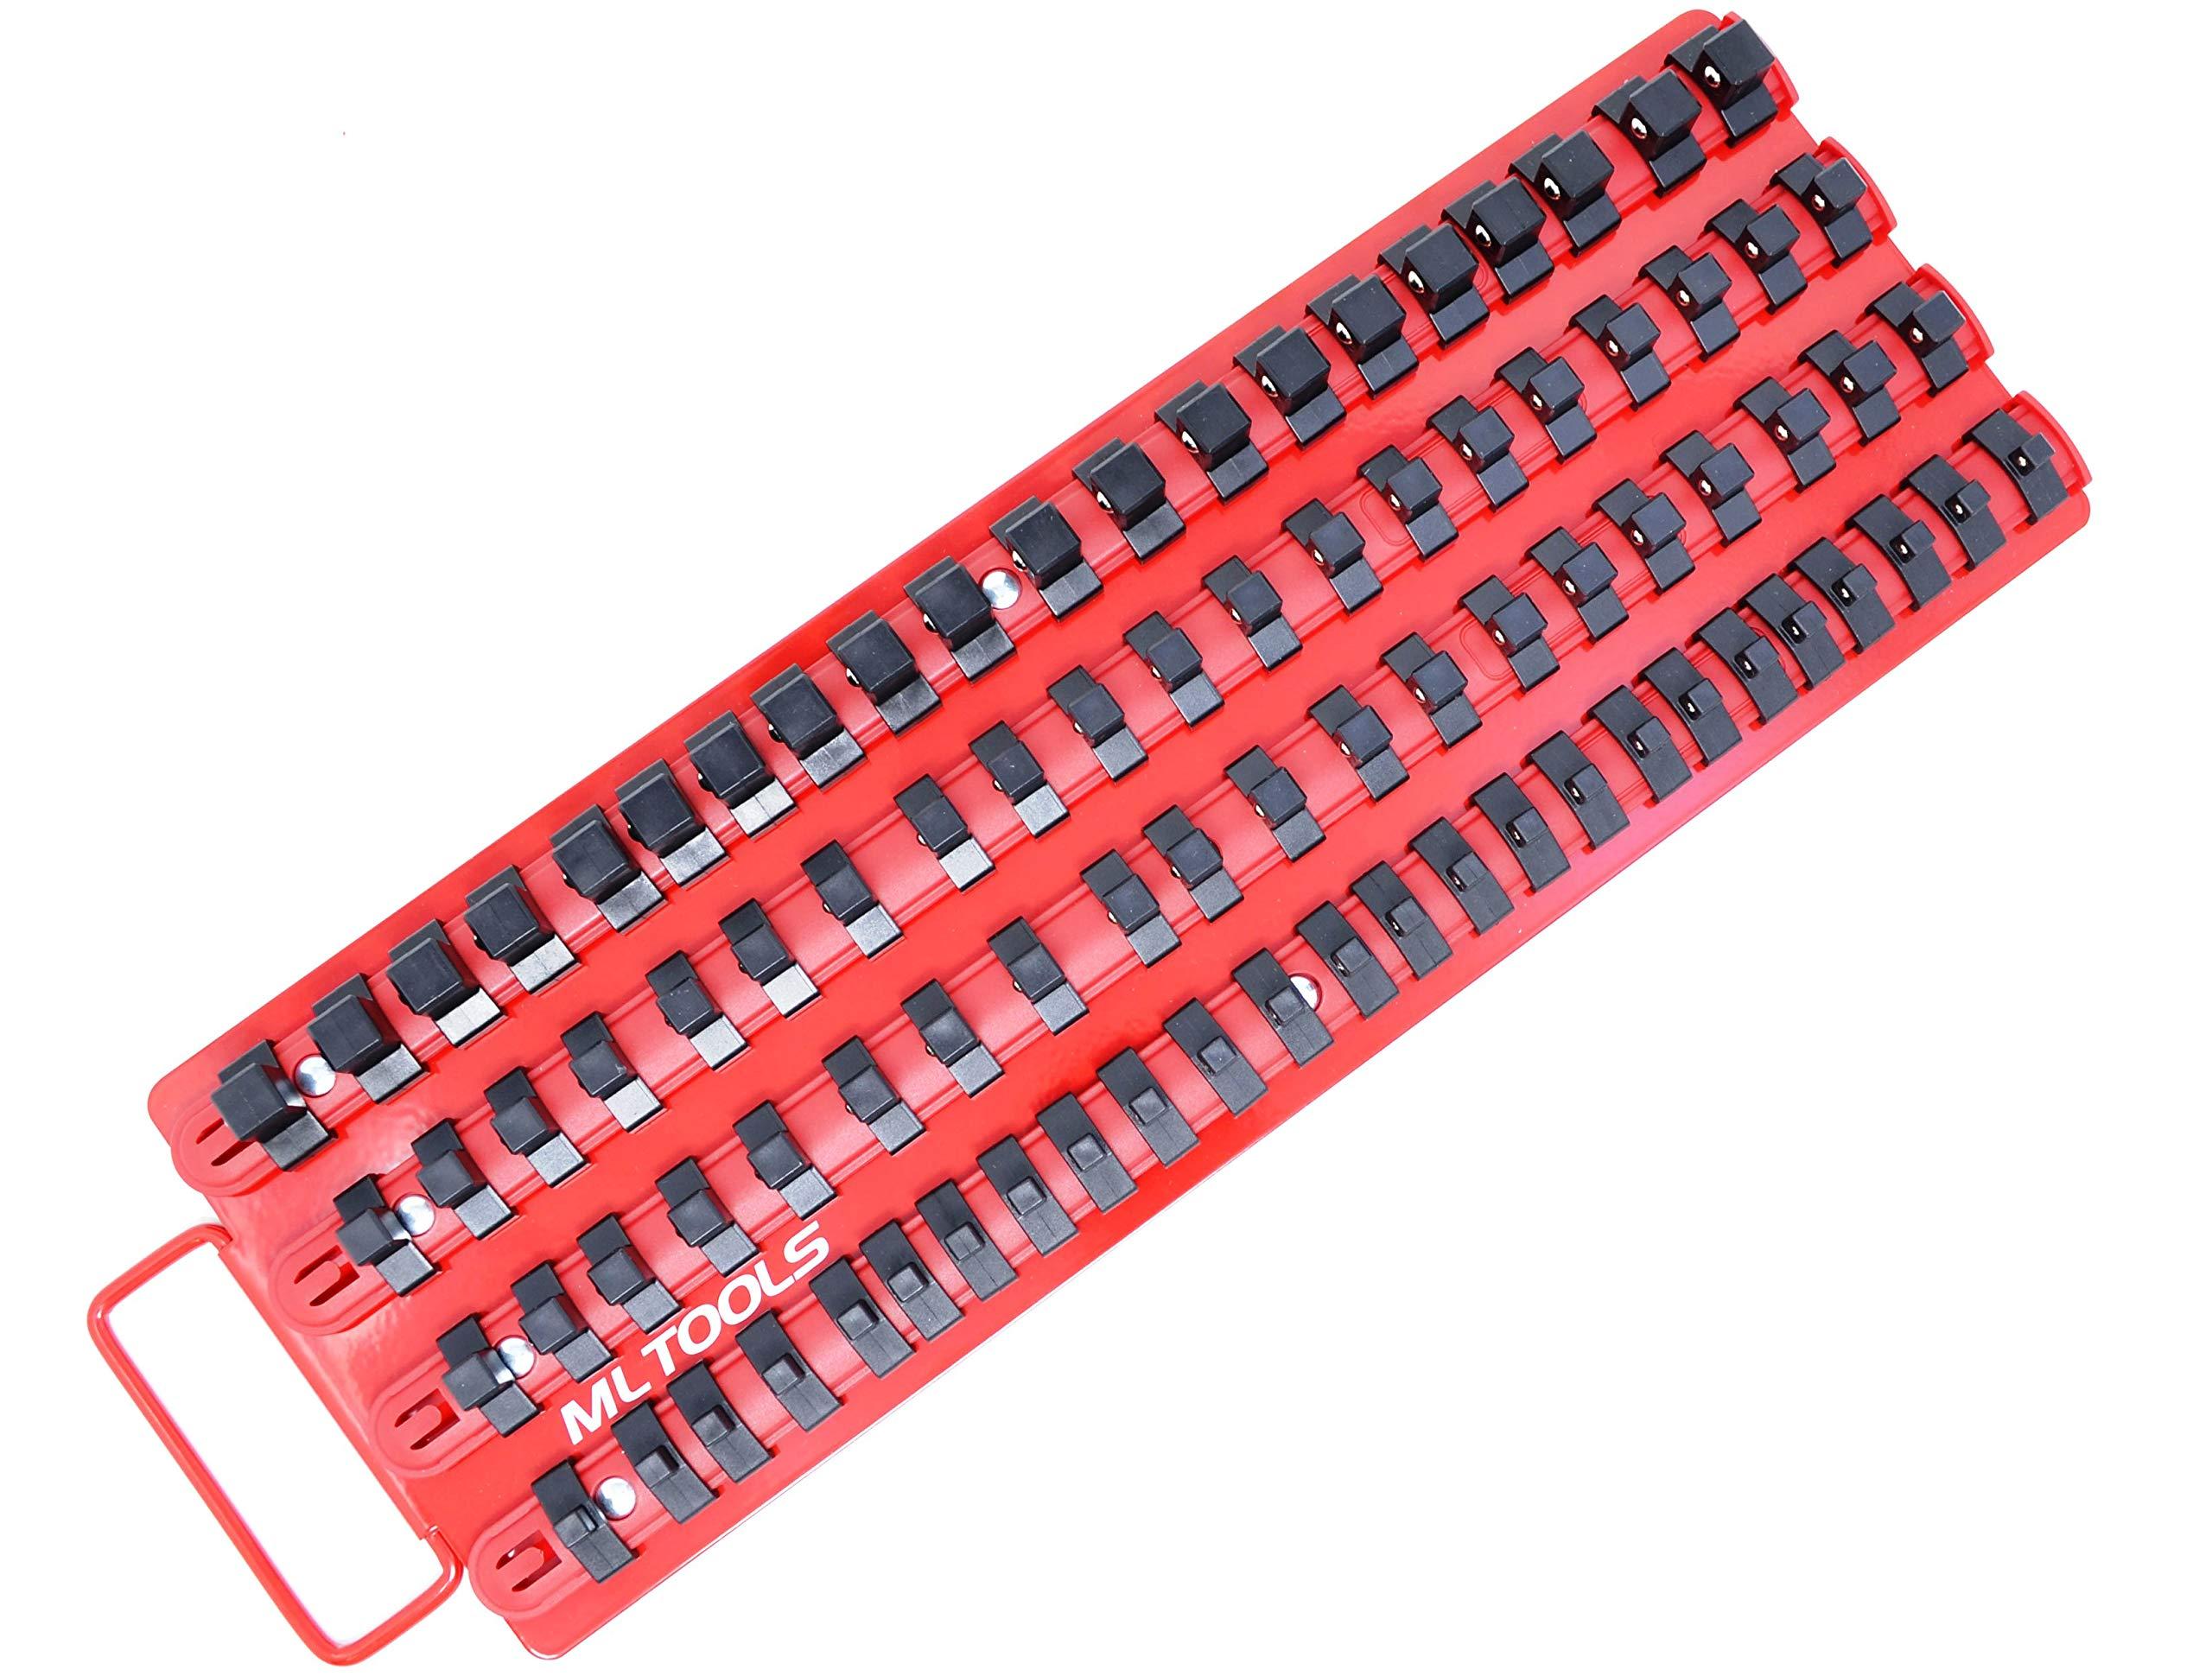 MLTOOLS Socket Organizer | Holds 85 Sockets | Ball Bearing Clips Socket Organizer Tray T-8316 1 Pack